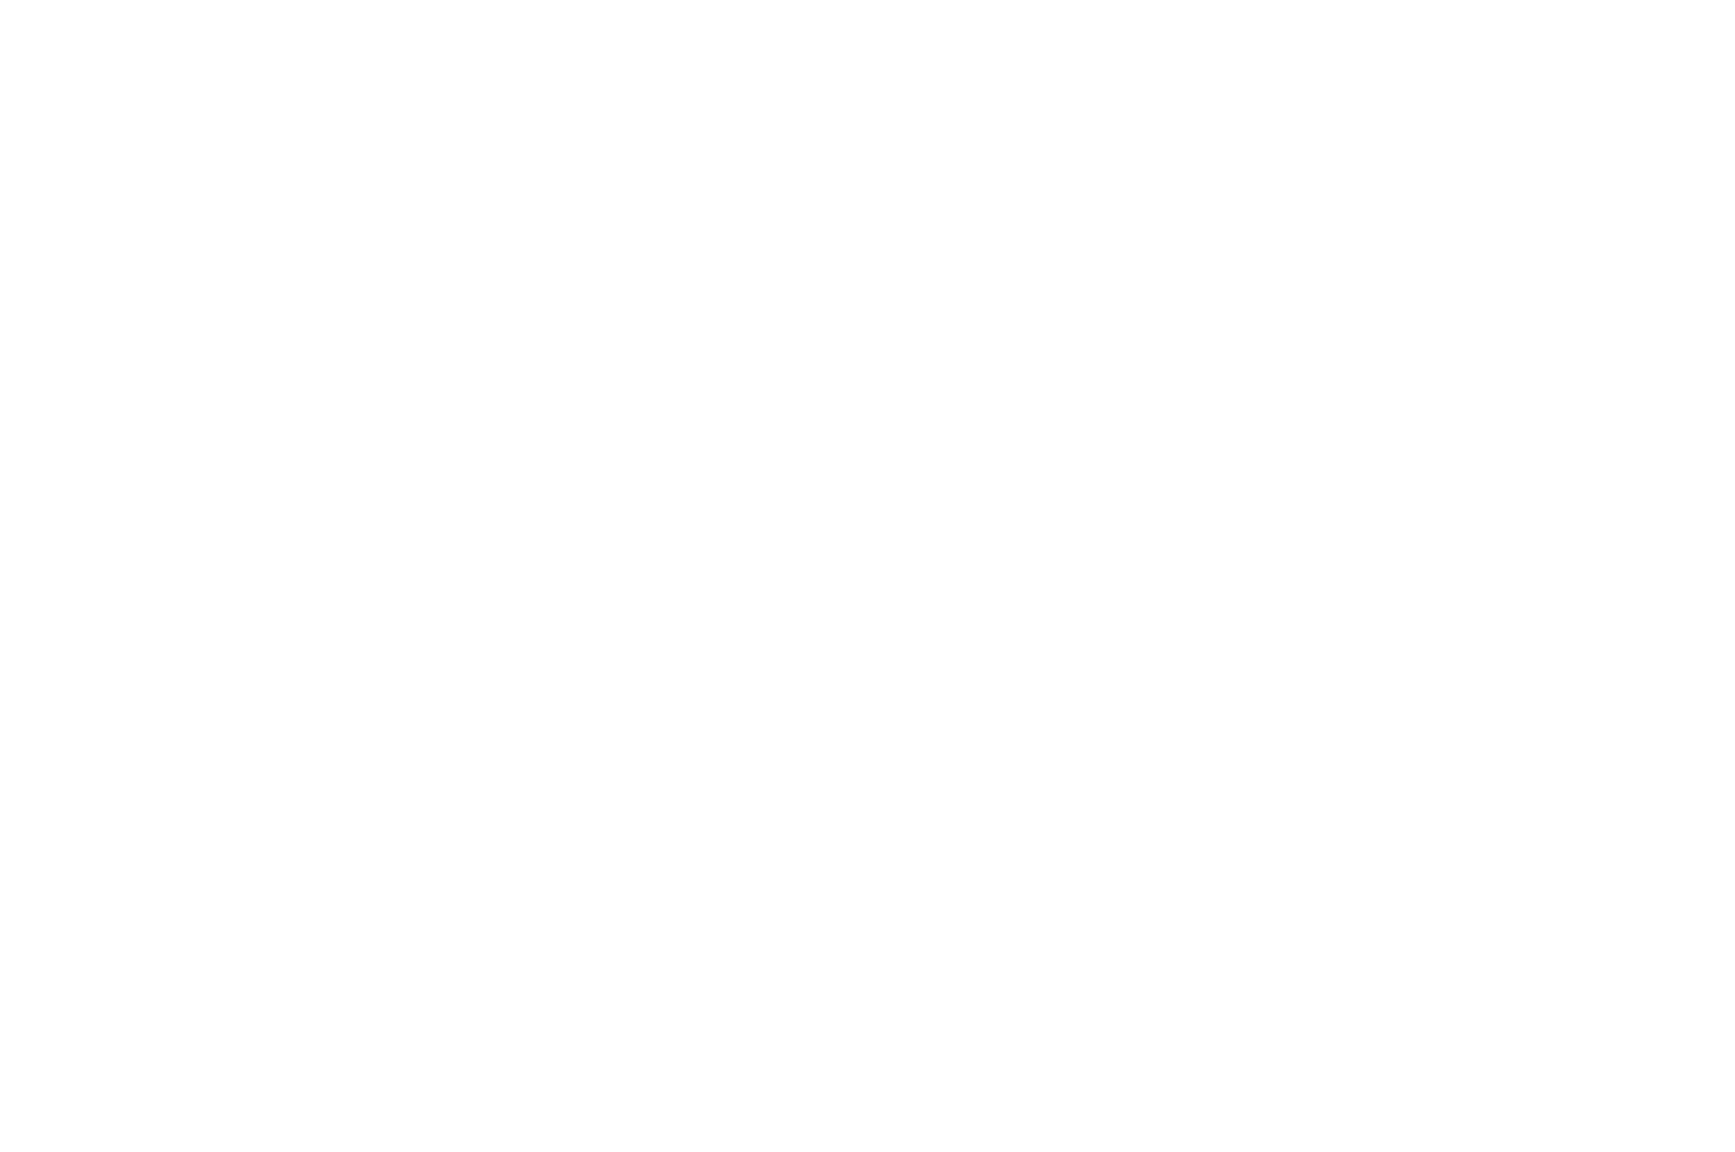 OFFICIAL SELECTION - Charleston International Film Festival - 2013.png